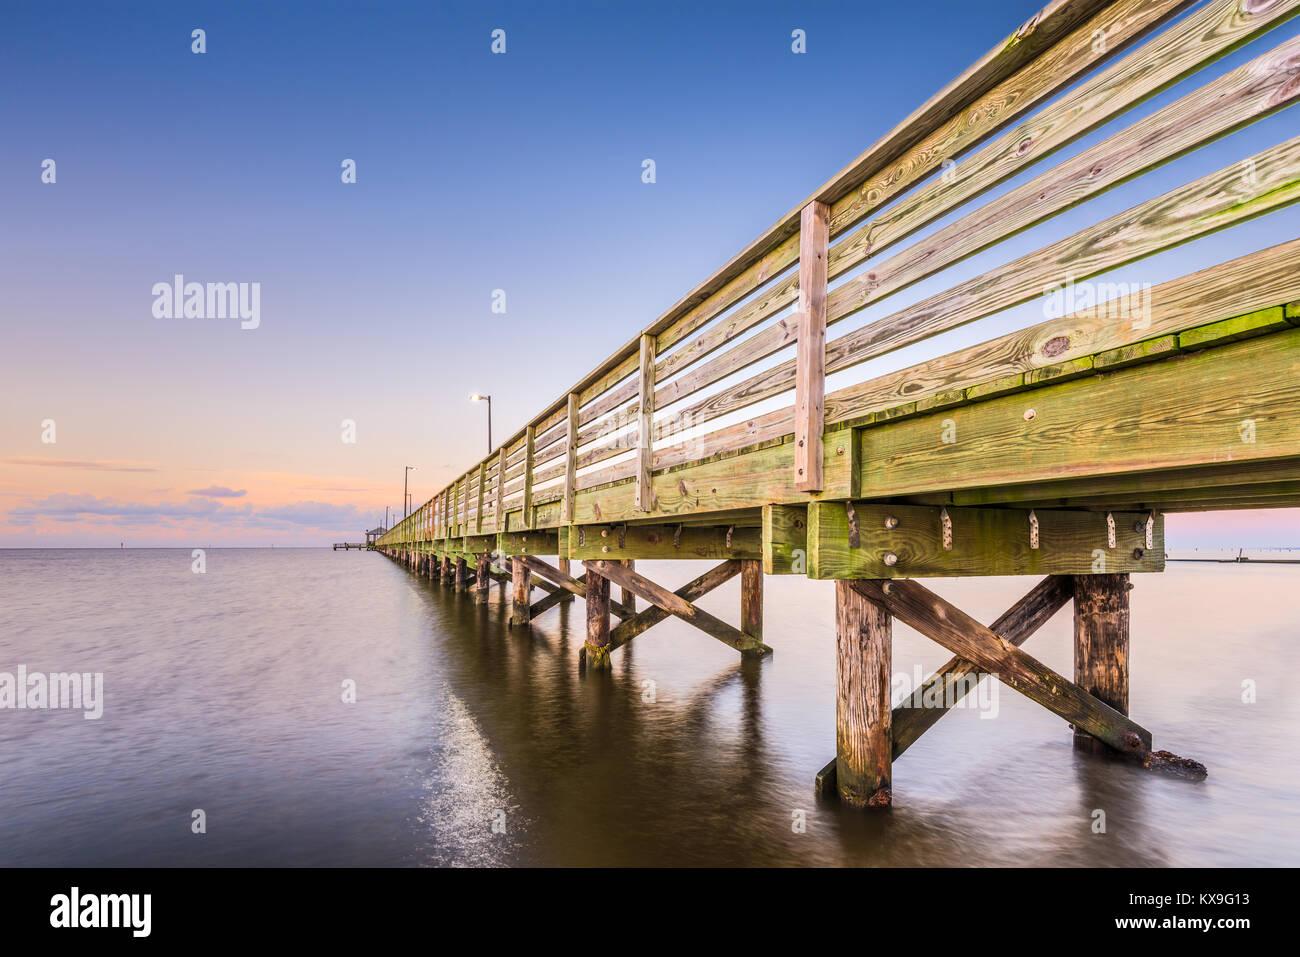 Biloxi Mississippi At Lighthouse Pier Stock Photo Alamy